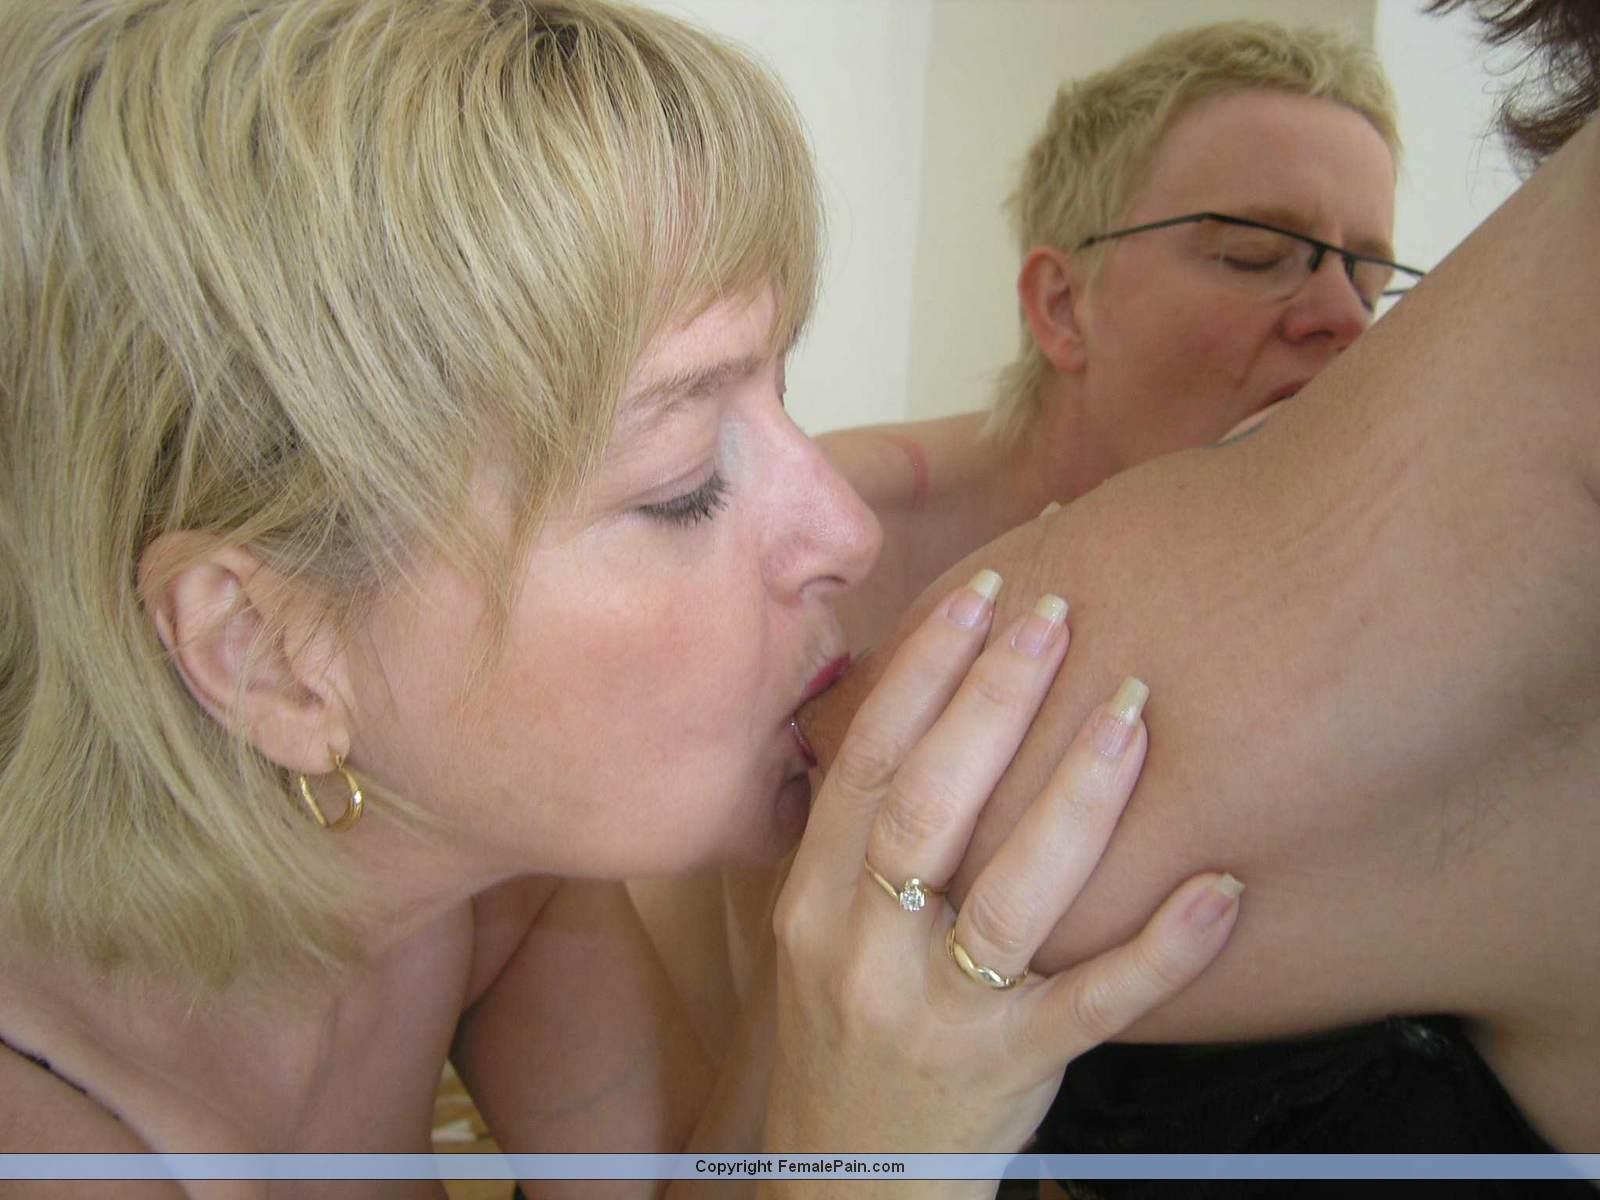 05 Amature Wife Sex. Free Amature